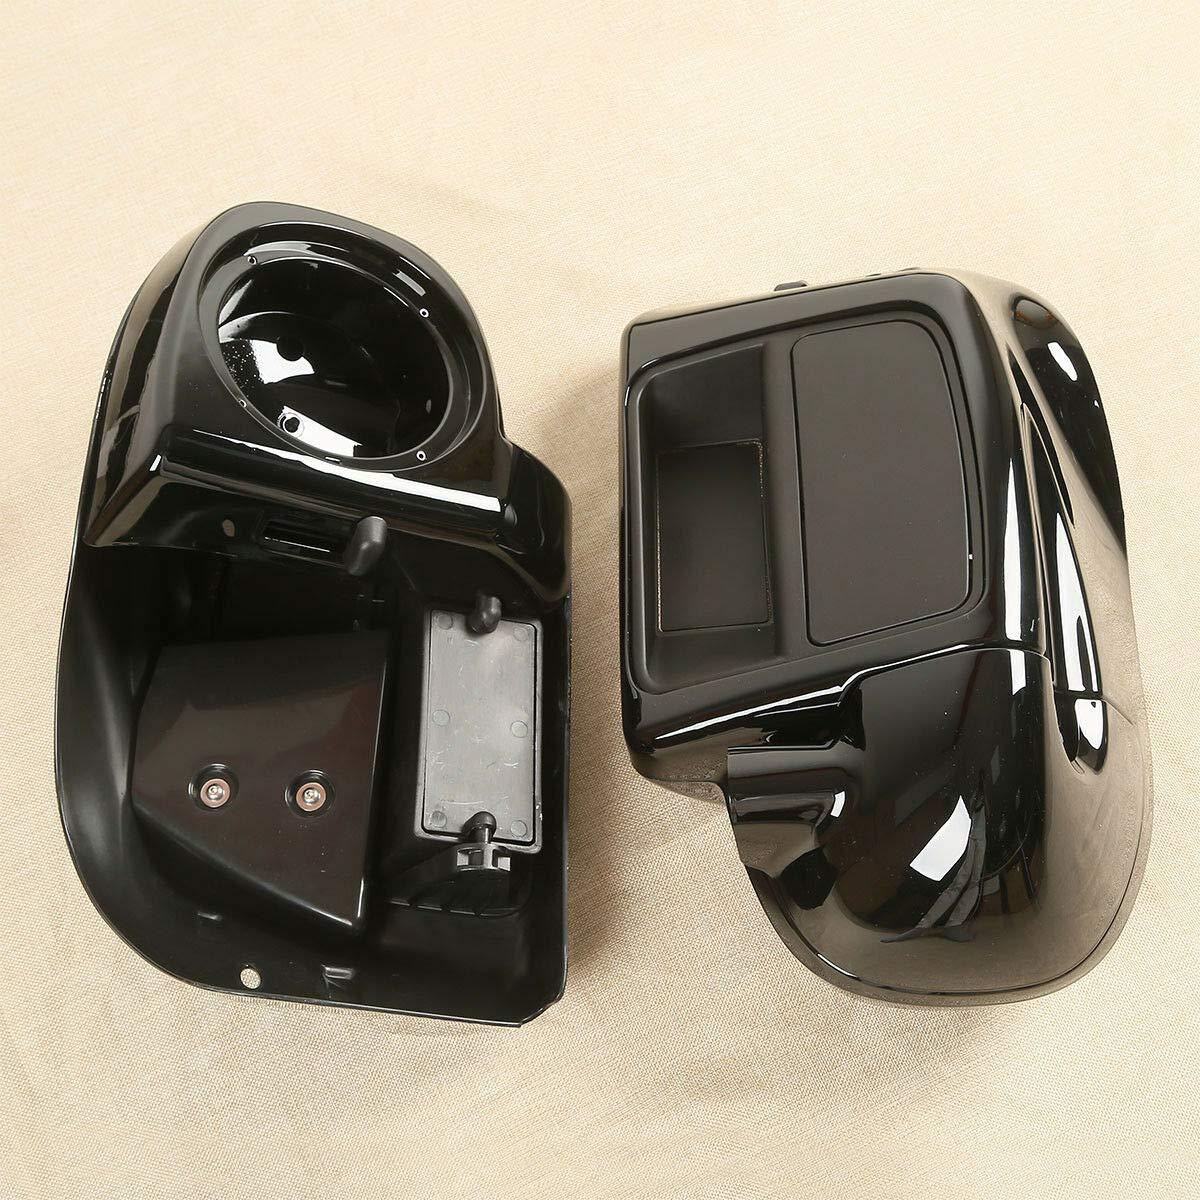 TCT-MT 6-1//2 Speaker Box Pod+Lower Vented Fairing For Harley Road King FLHR Street Glide FLHX FLHXS 2014-2020; Road Glide FLTRX FLTRXS Freewheeler FLRT 2015-2020; Electra Glide FLHTCU 2014-2019 Black